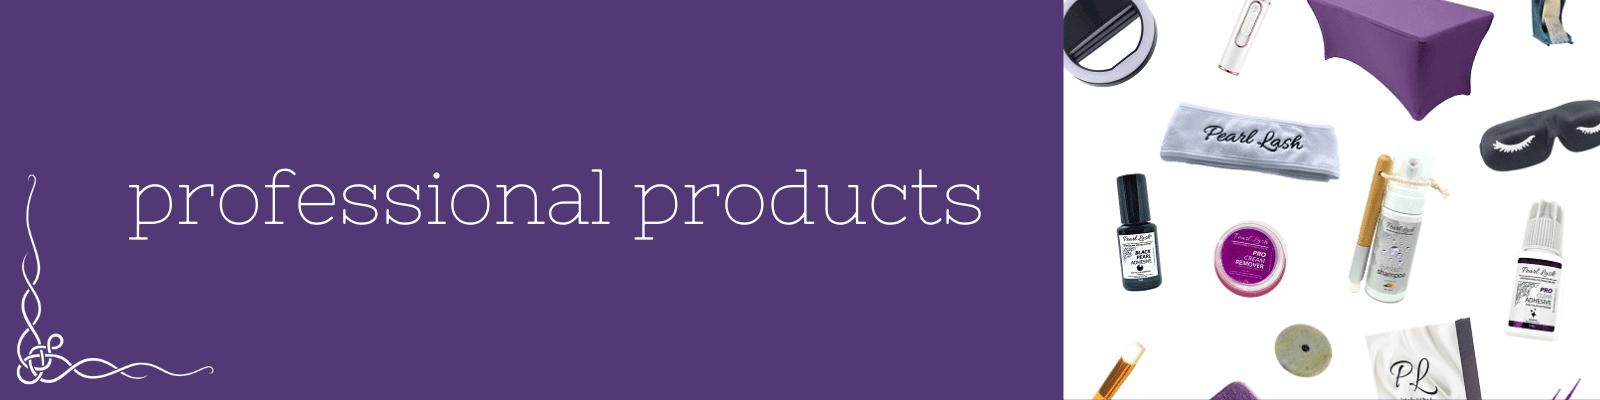 Pearl Lash Professional Eyelash Extension Products